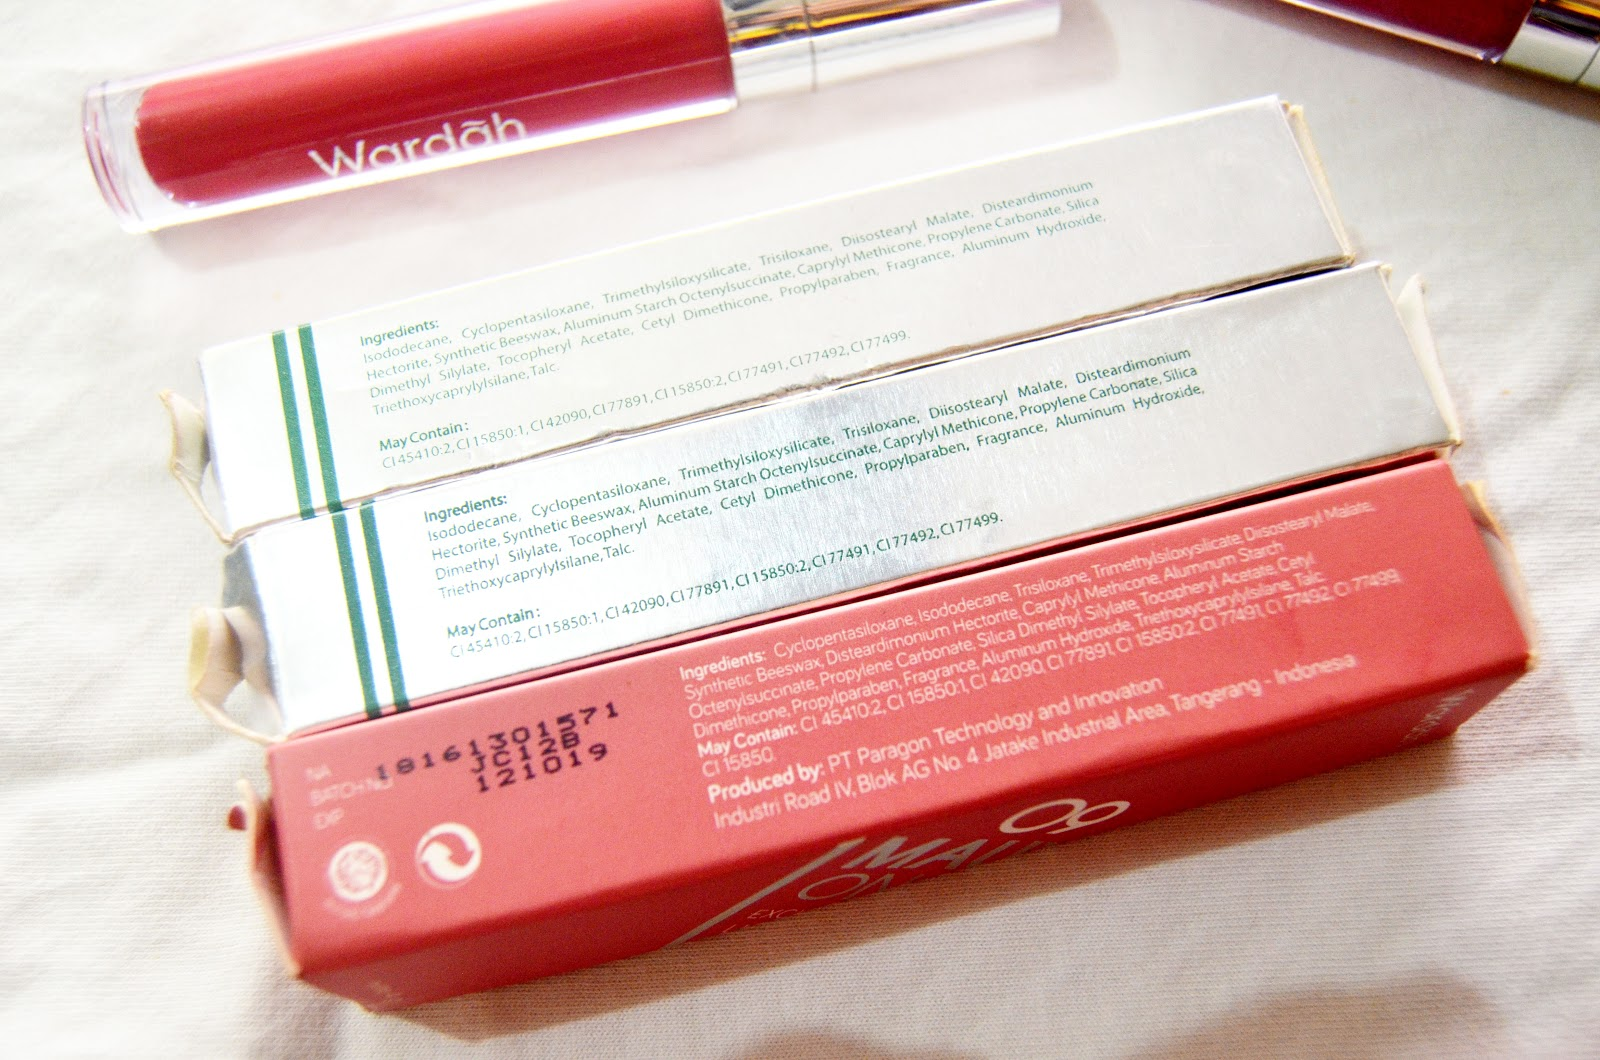 Review Wardah Exclusive Matte Lip Cream 01 07 09 12 Intense Lipstik No9 Kemasannya Menurut Gue Kece Banget Simpel Cantik Elegan Mirip Colorpop Tapi Masih Ada Ciri Khas Desain Yang Nggak Rame Megangnya Juga Enak Gitu